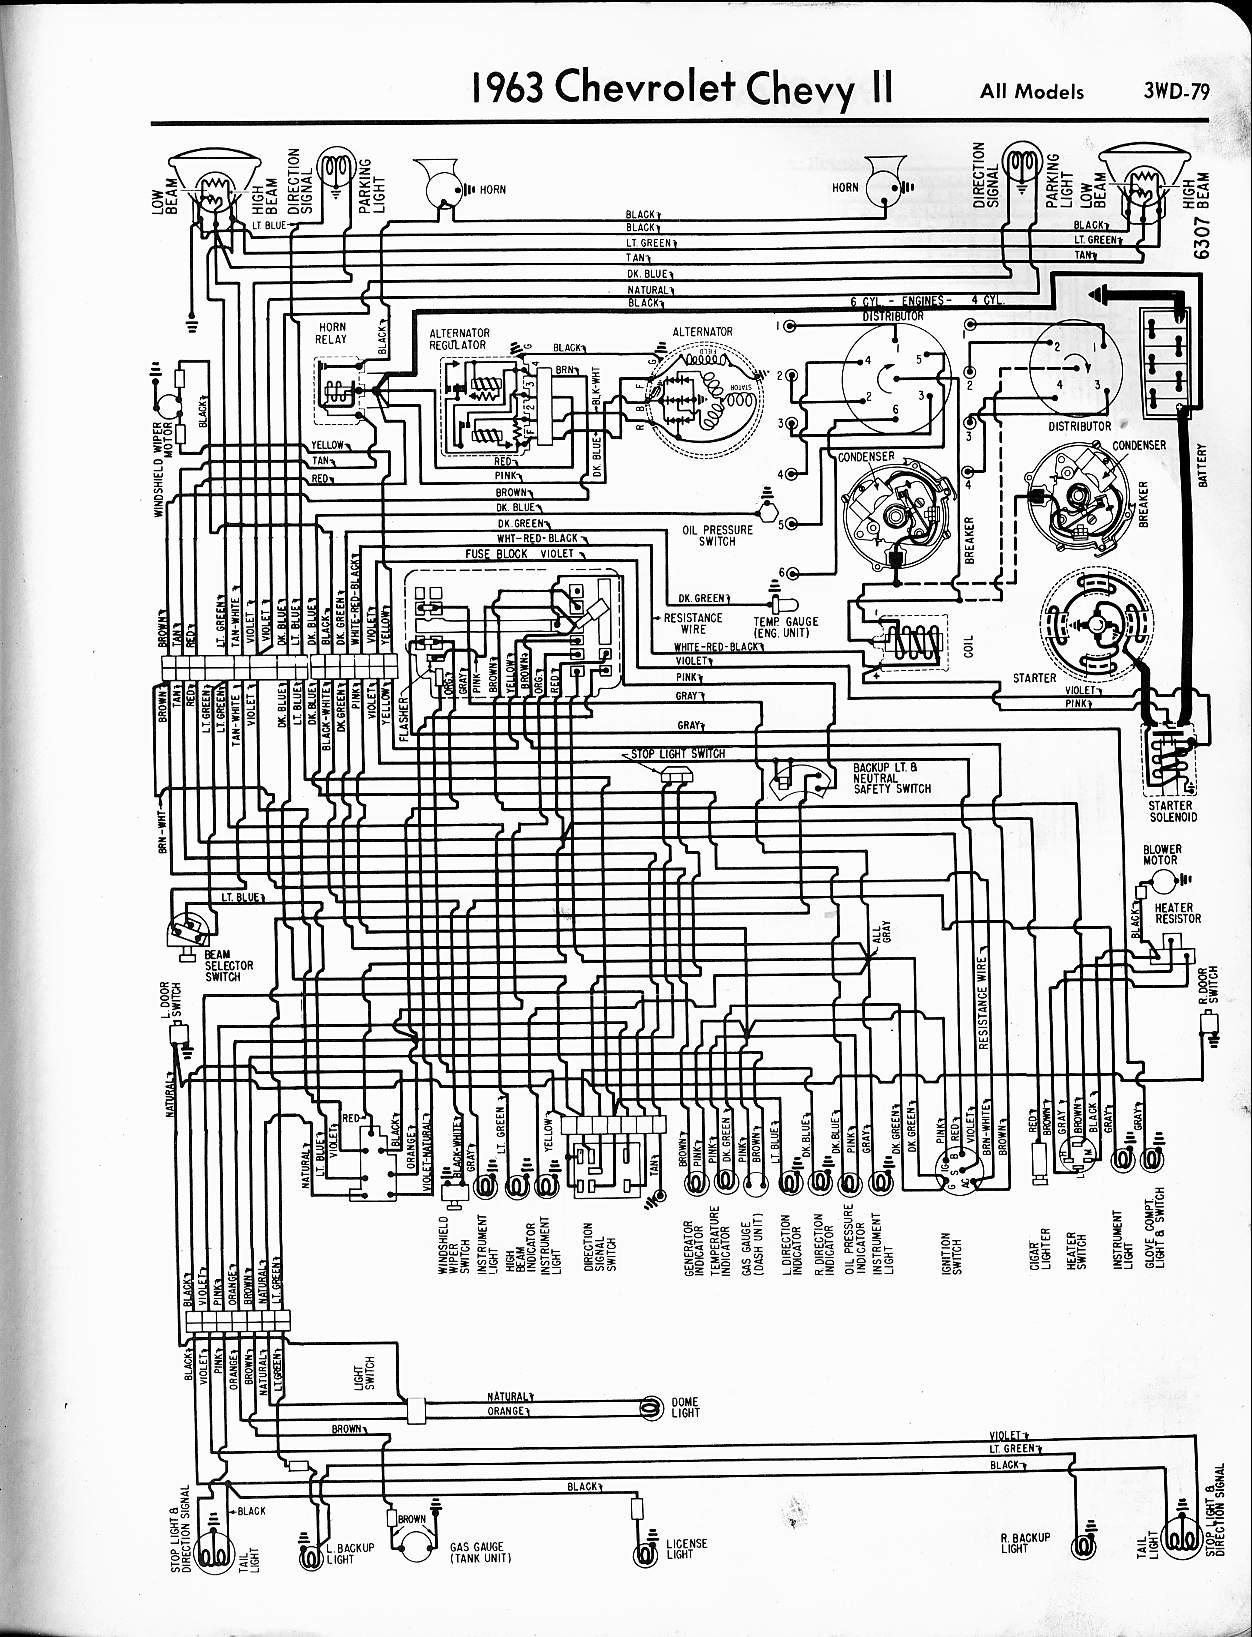 MWireChev63_3WD 079?resize\\\\\\\\\\\\\\\=665%2C869 1965 c10 wiring diagram 66 chevy c10 alternator wiring diagram 1964 chevrolet impala ignition wiring at webbmarketing.co